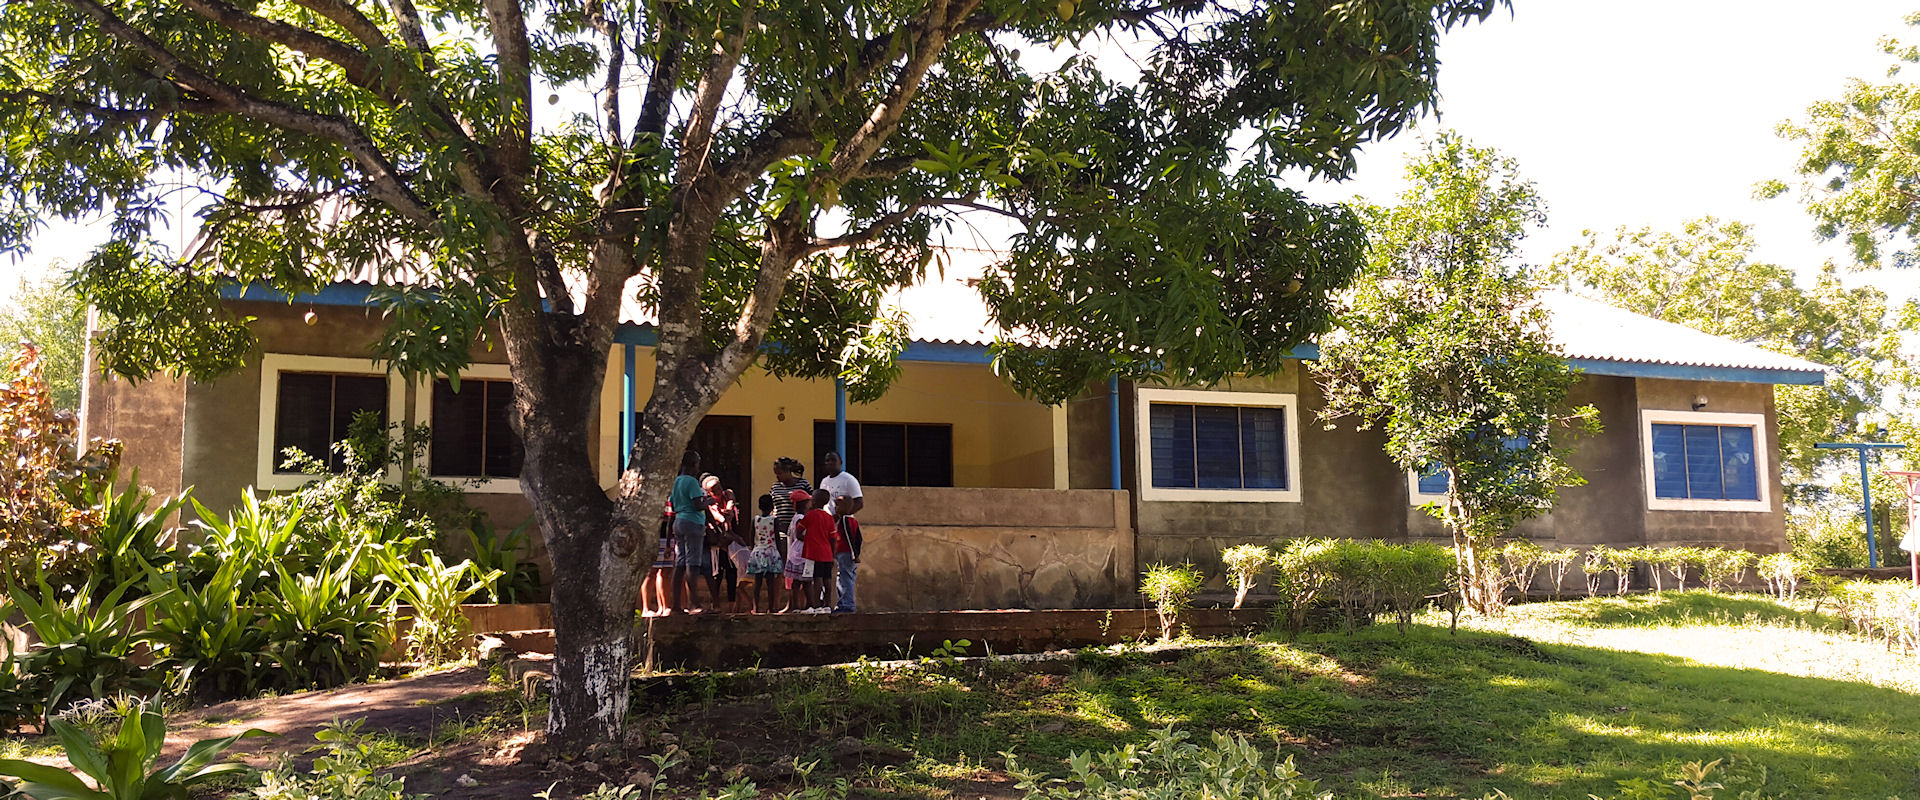 Diani Childrens Village | Voorzijde opvanghuis Diani Kenia